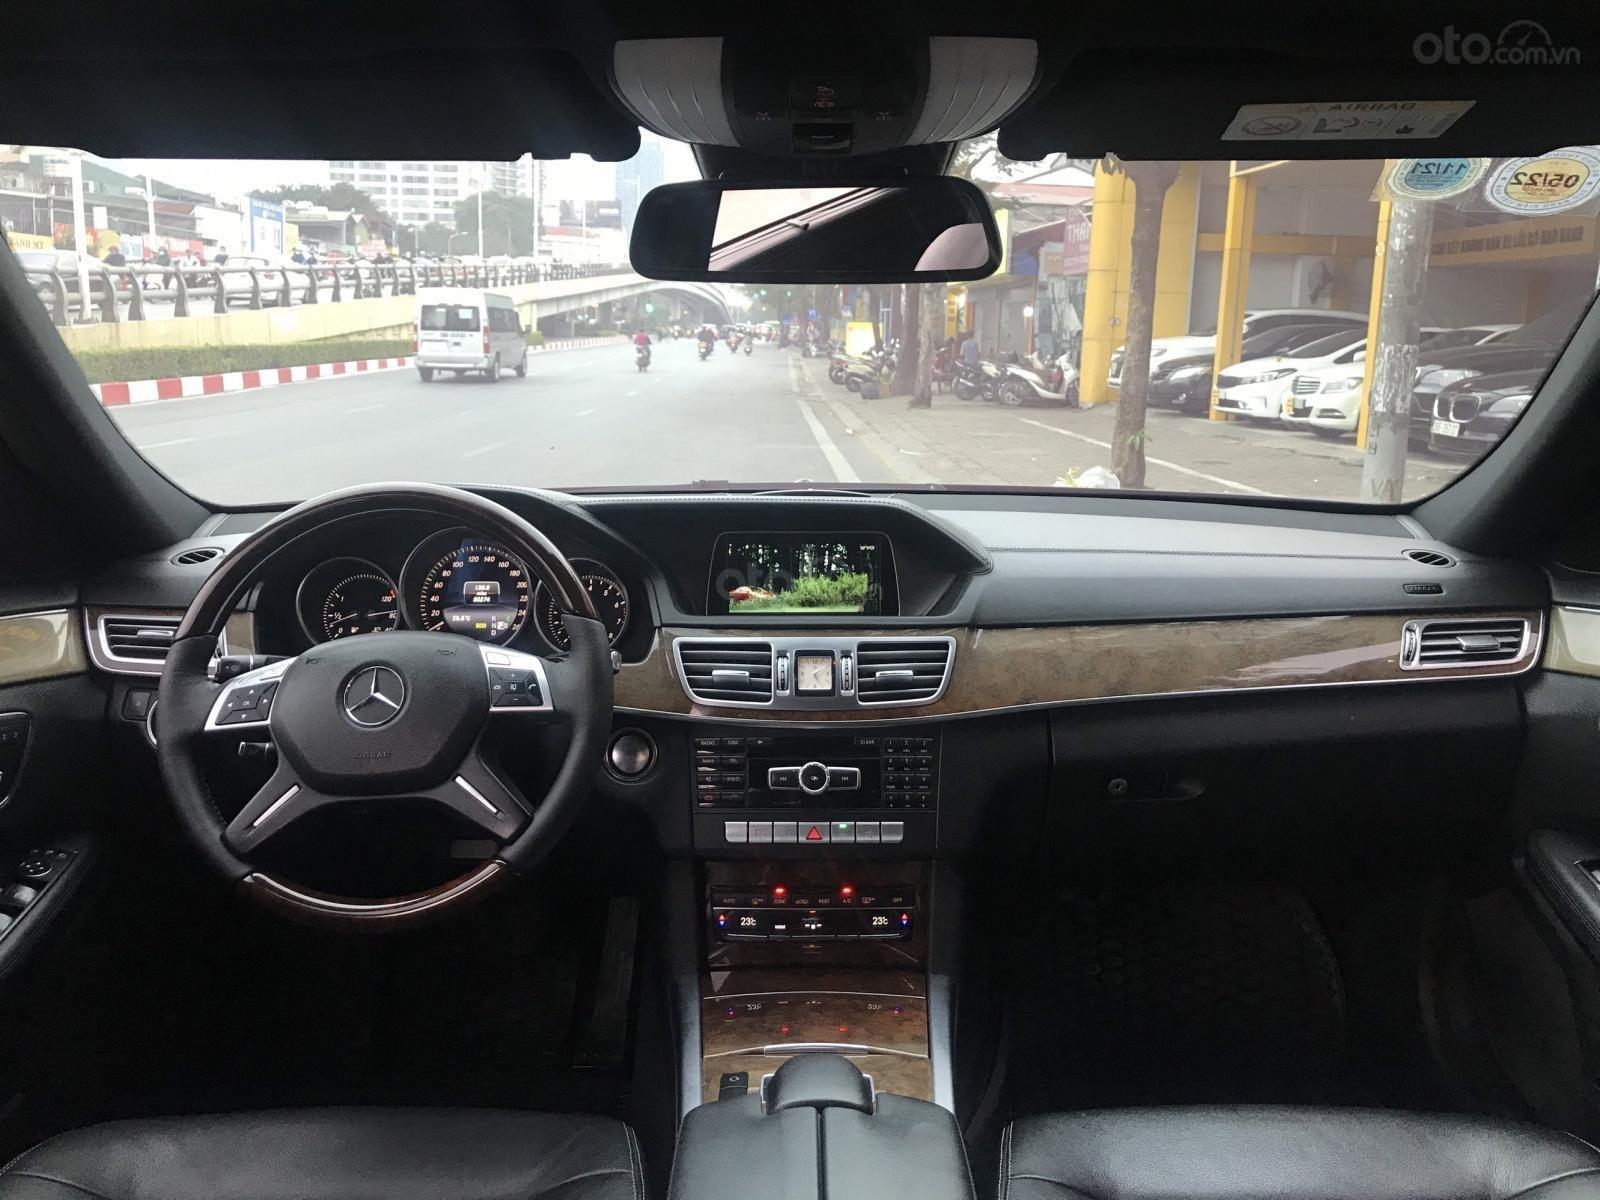 Cần bán Mercedes E400 sản xuất 2014 (3)